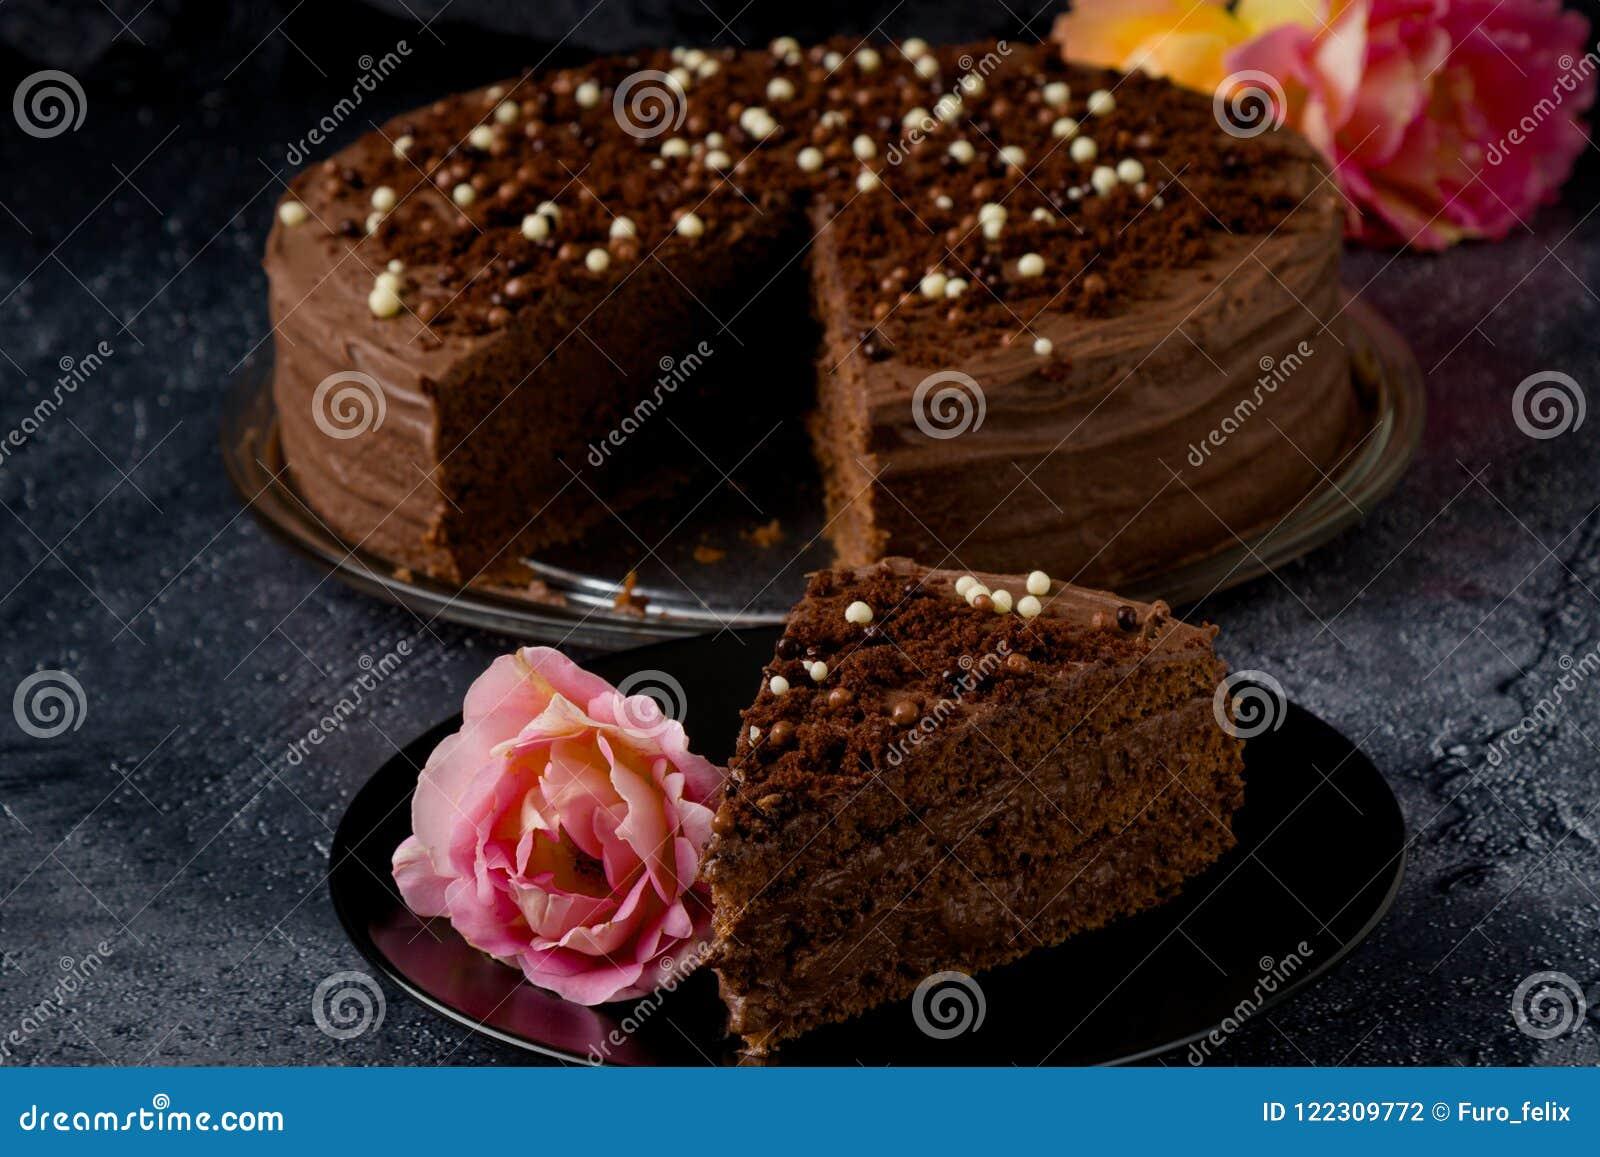 Dark Brown Chocolate Cake With Decoration Stock Photo Image Of